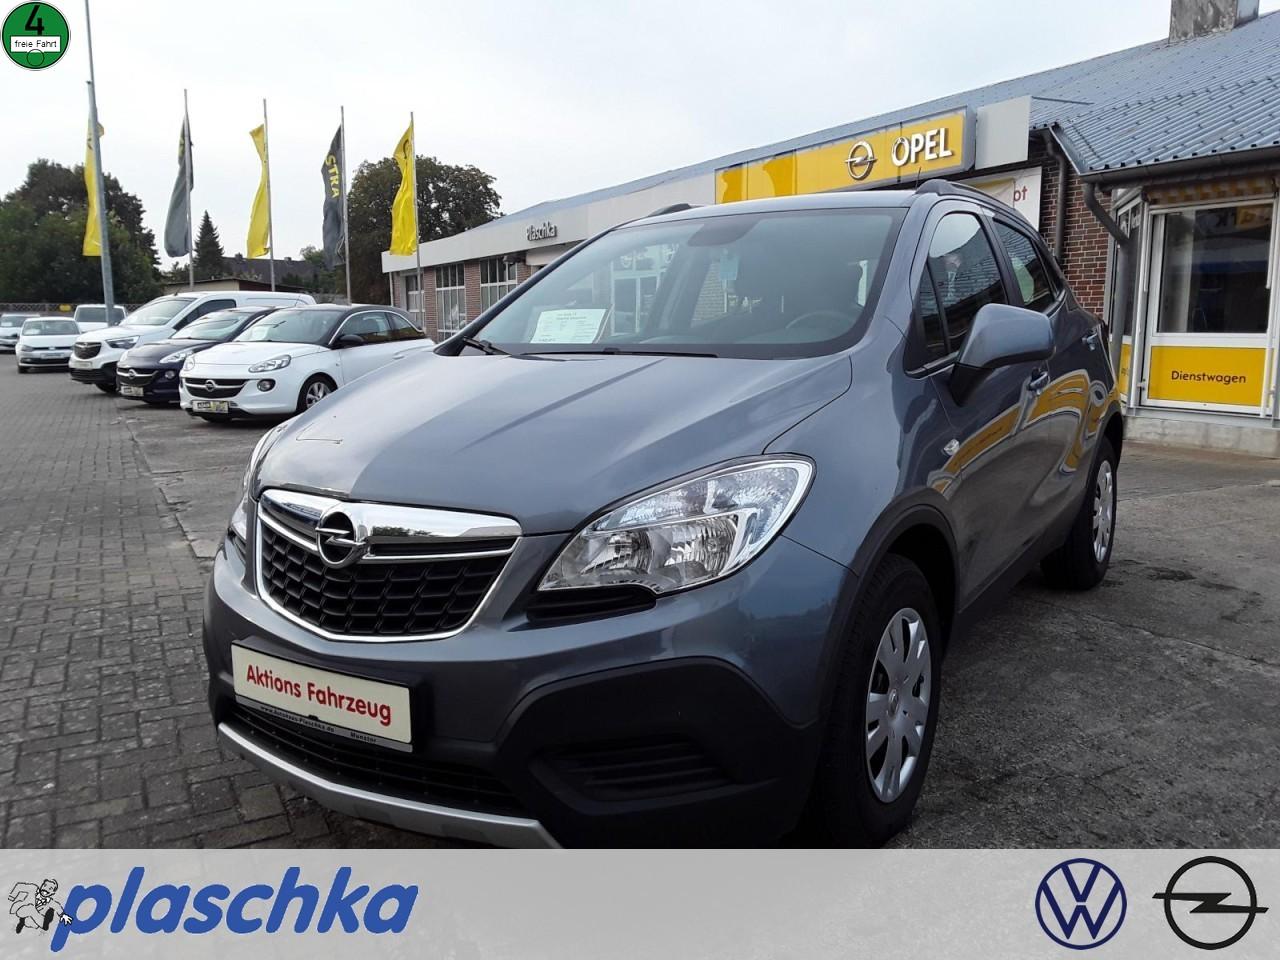 Opel Mokka 1.6 Tempomat Klimaanlage Klima, Jahr 2014, Benzin